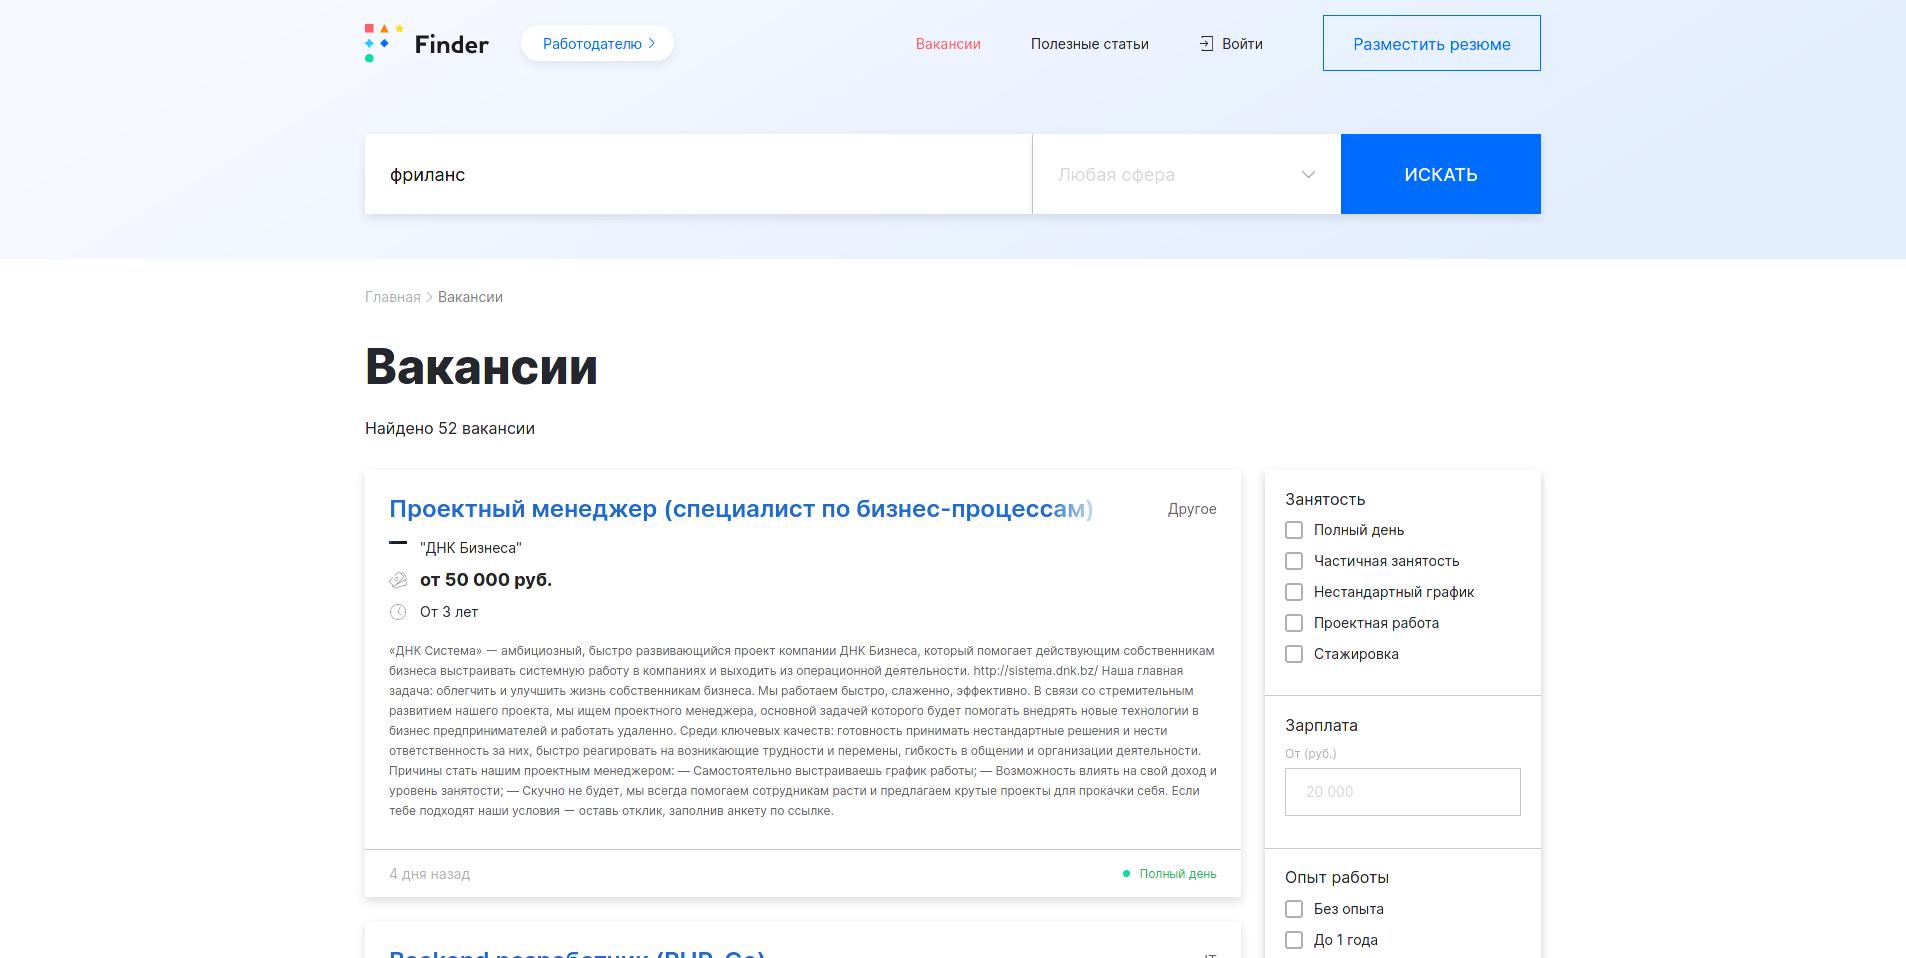 Screenshot_2021-03-05 Вакансии — Finder.png